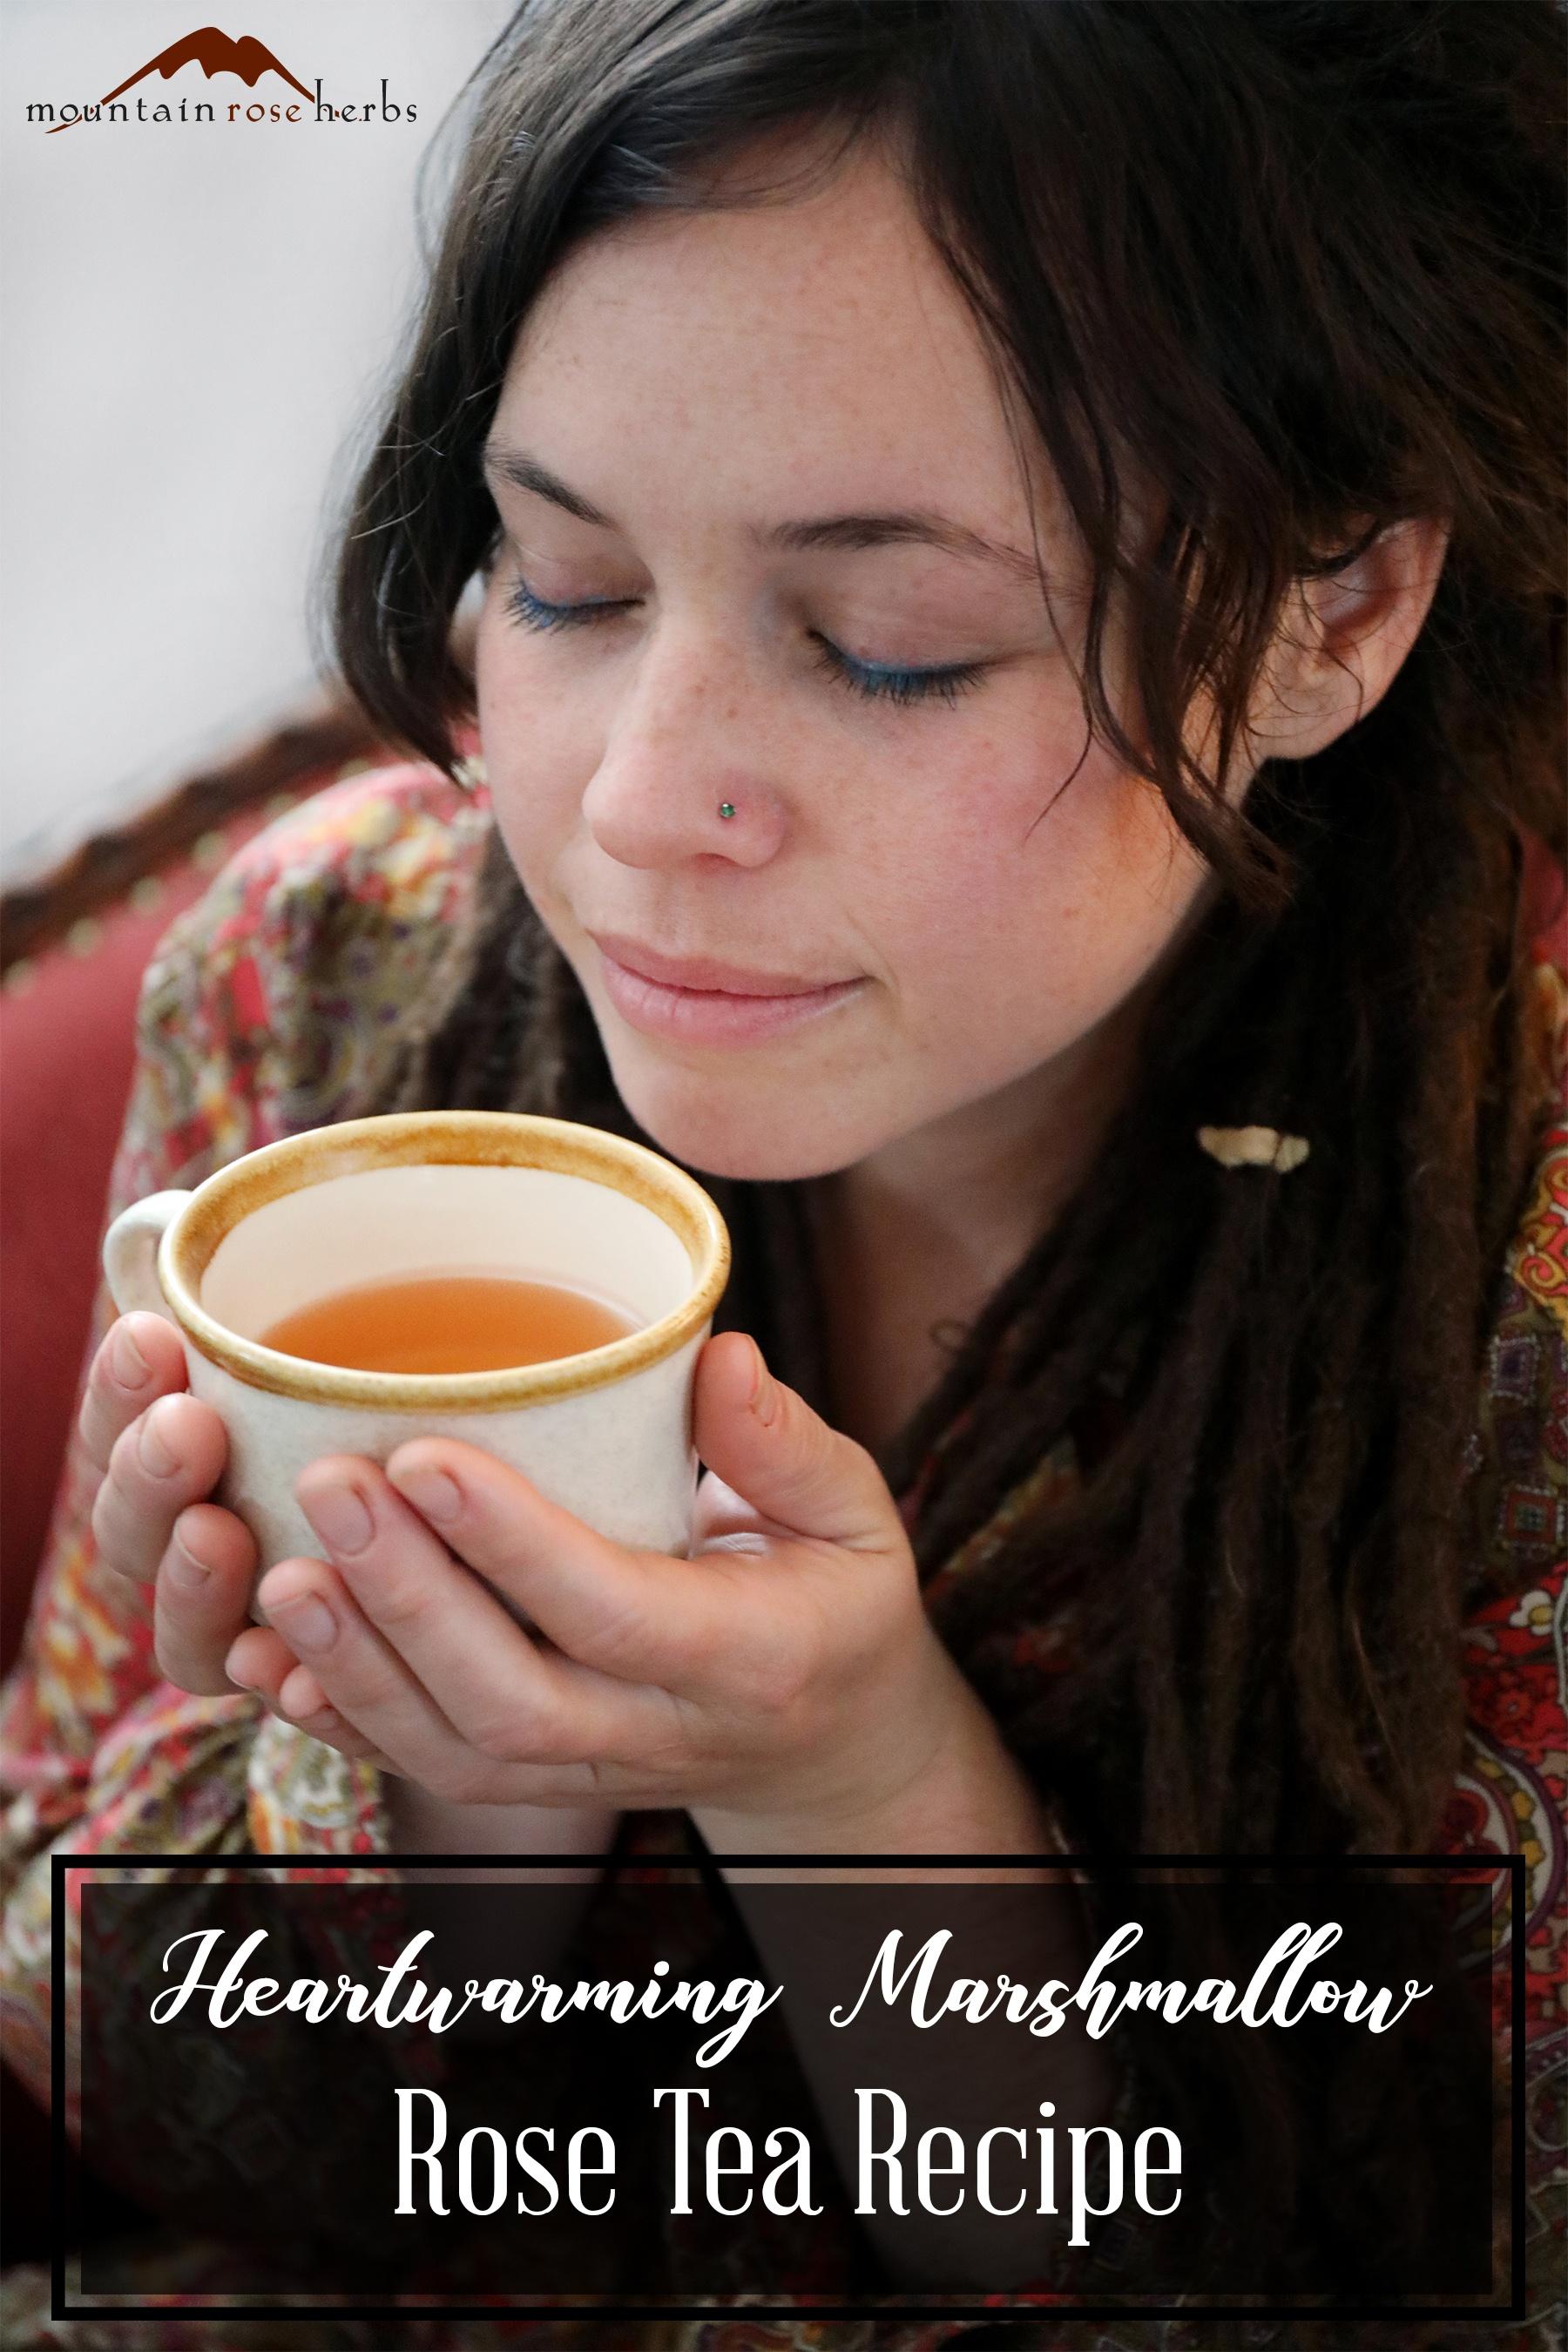 PInterest Pin for Heartwarming Marshmallow Rose Tea Recipe from Mountain Rose Herbs